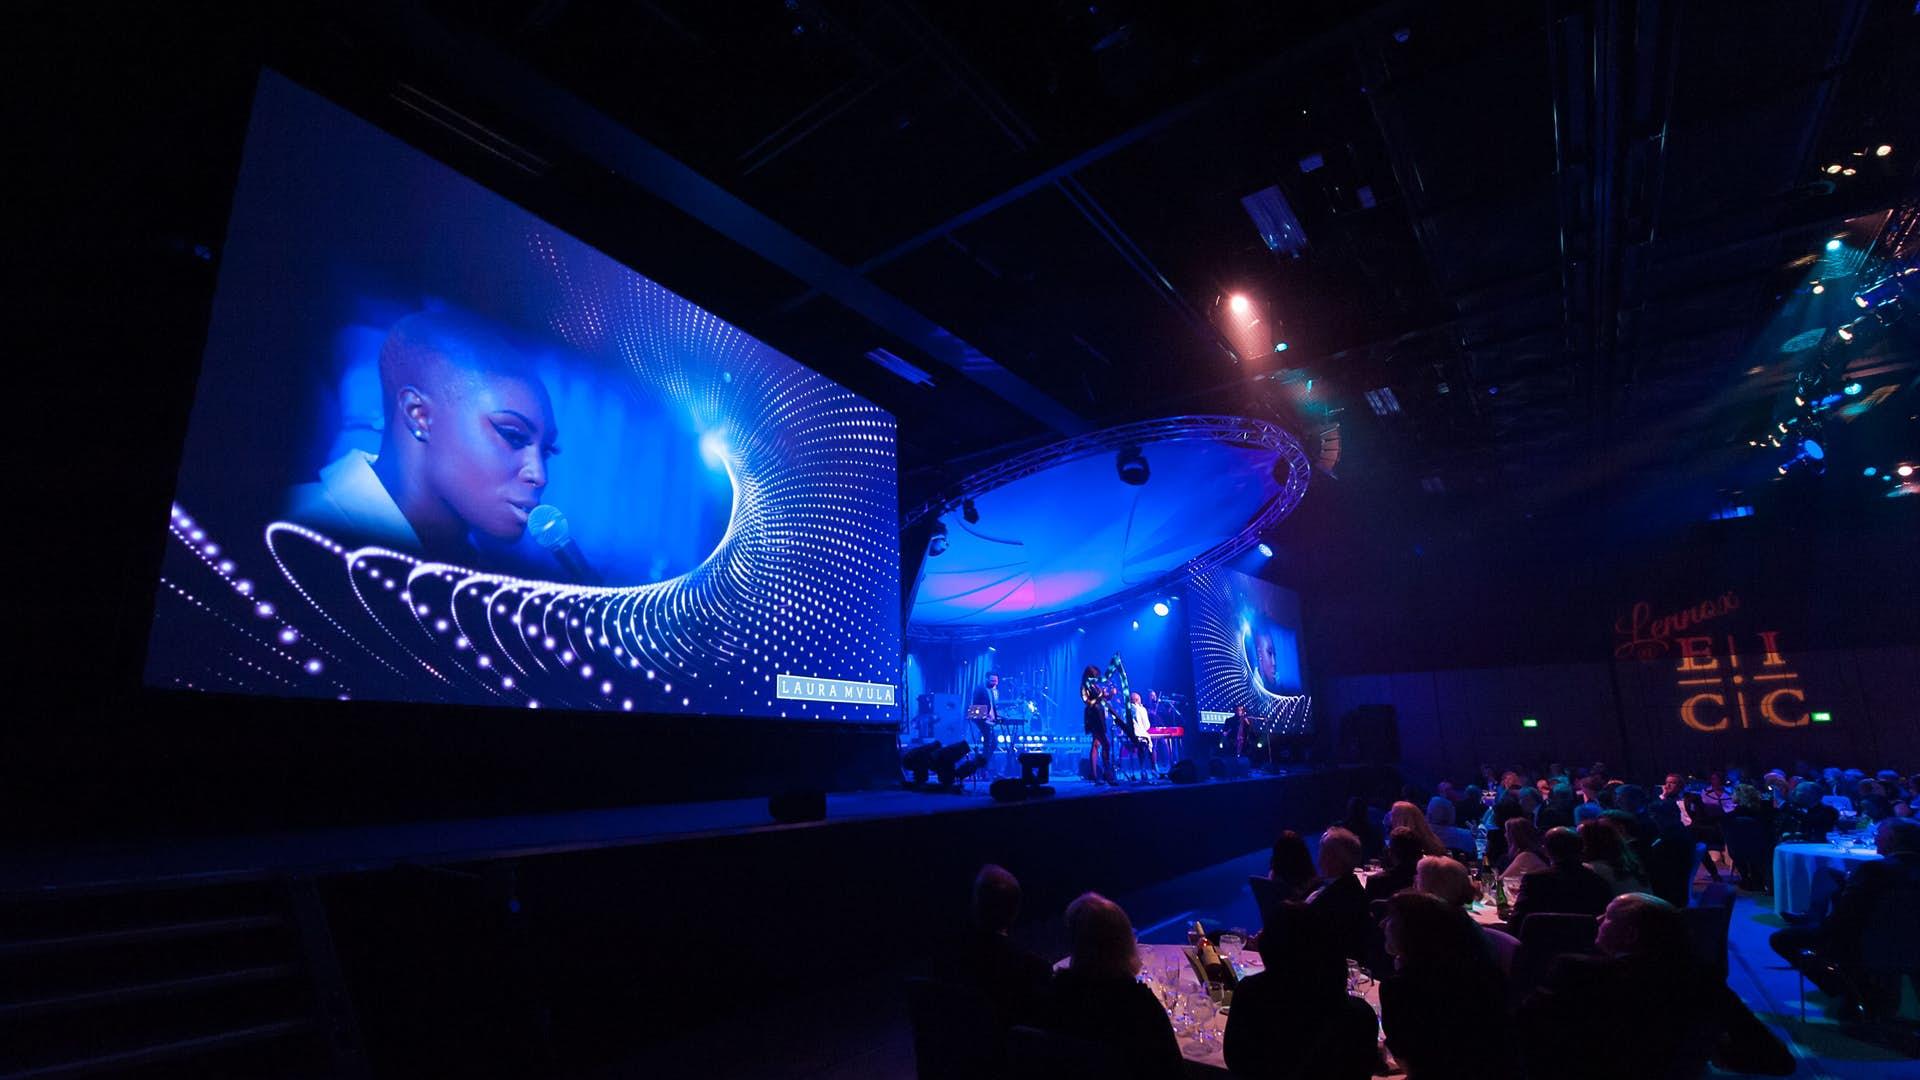 The Lennox Suite at Edinburgh International Conference Centre